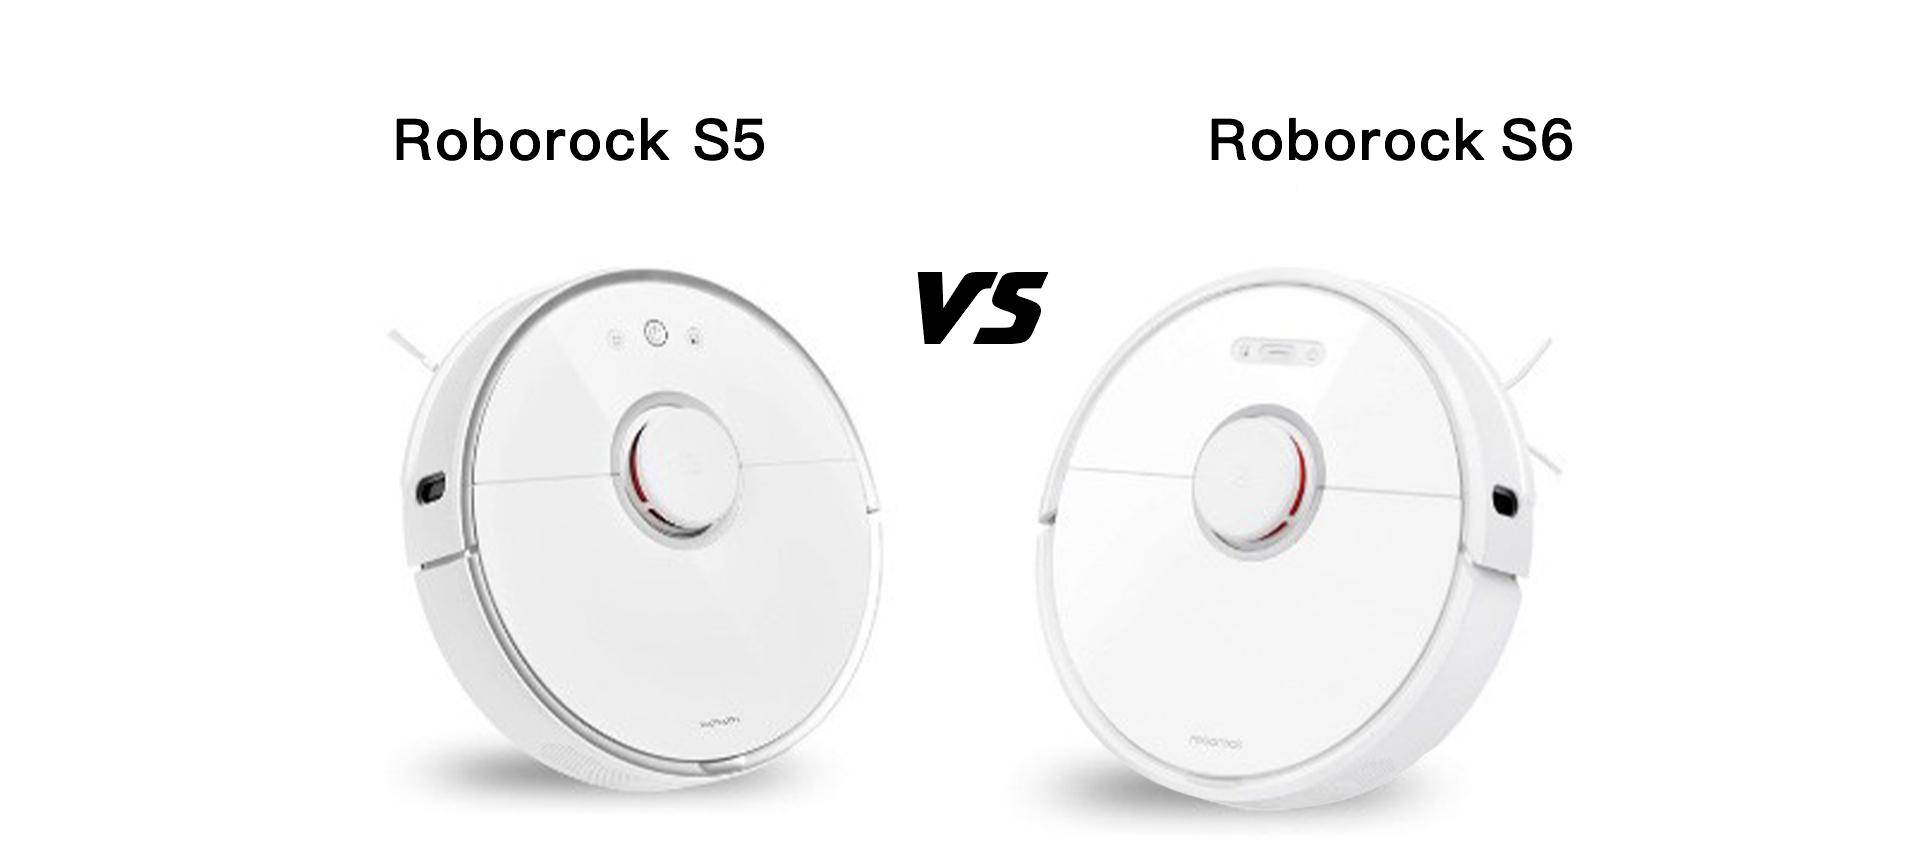 Roborock S6 vs. Roborock s5